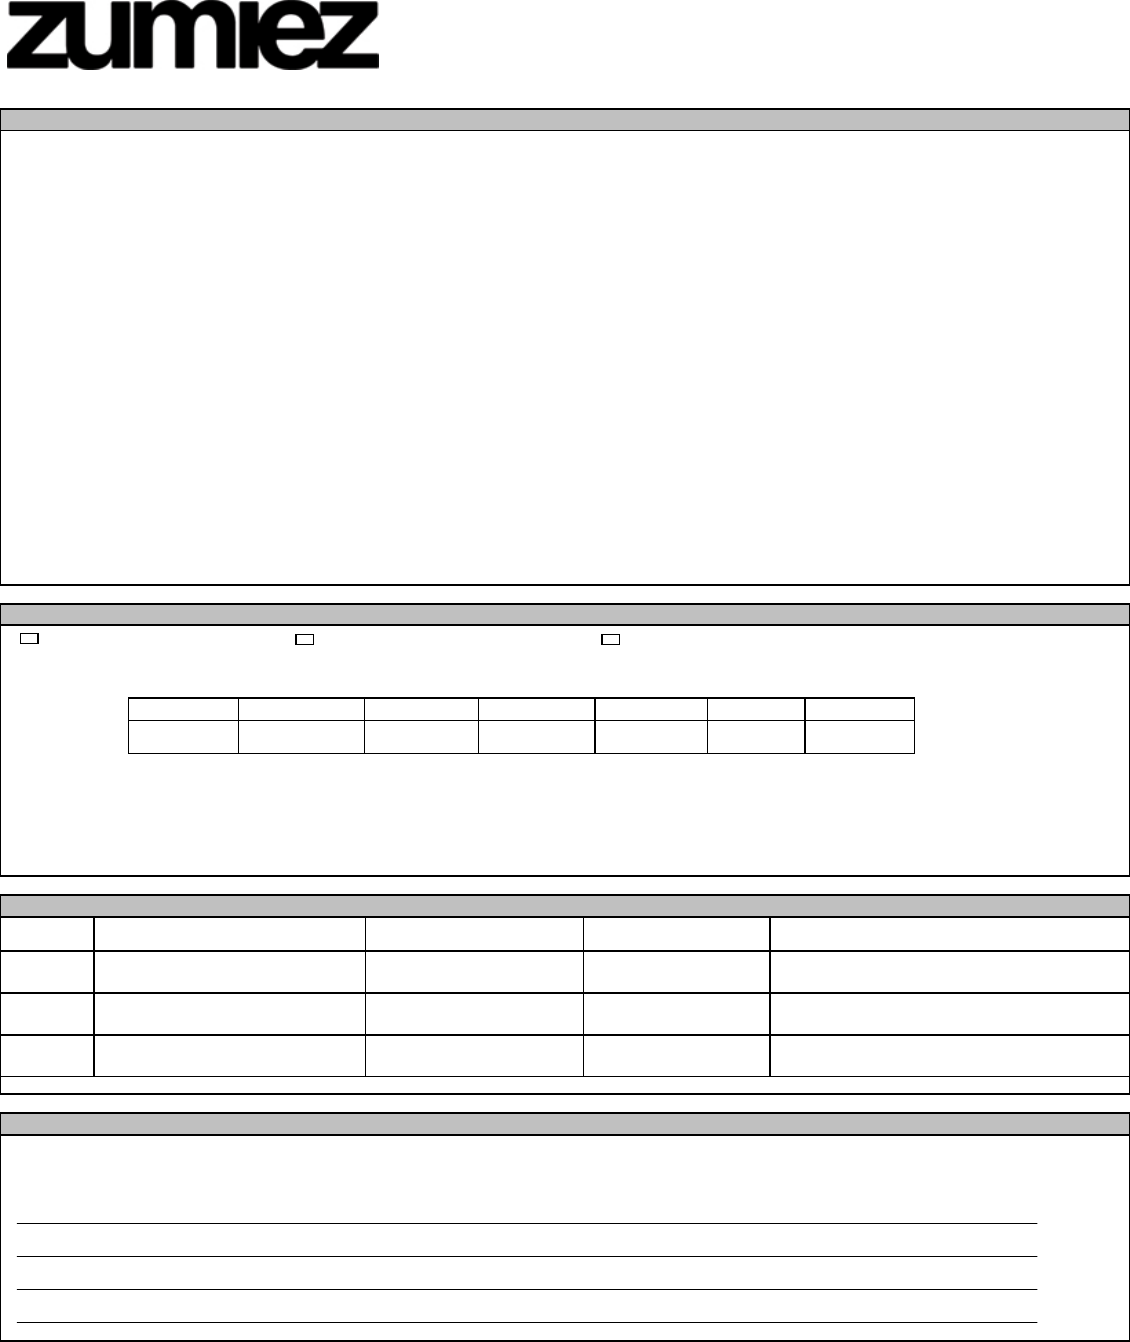 Free Printable Zumiez Job Application Form